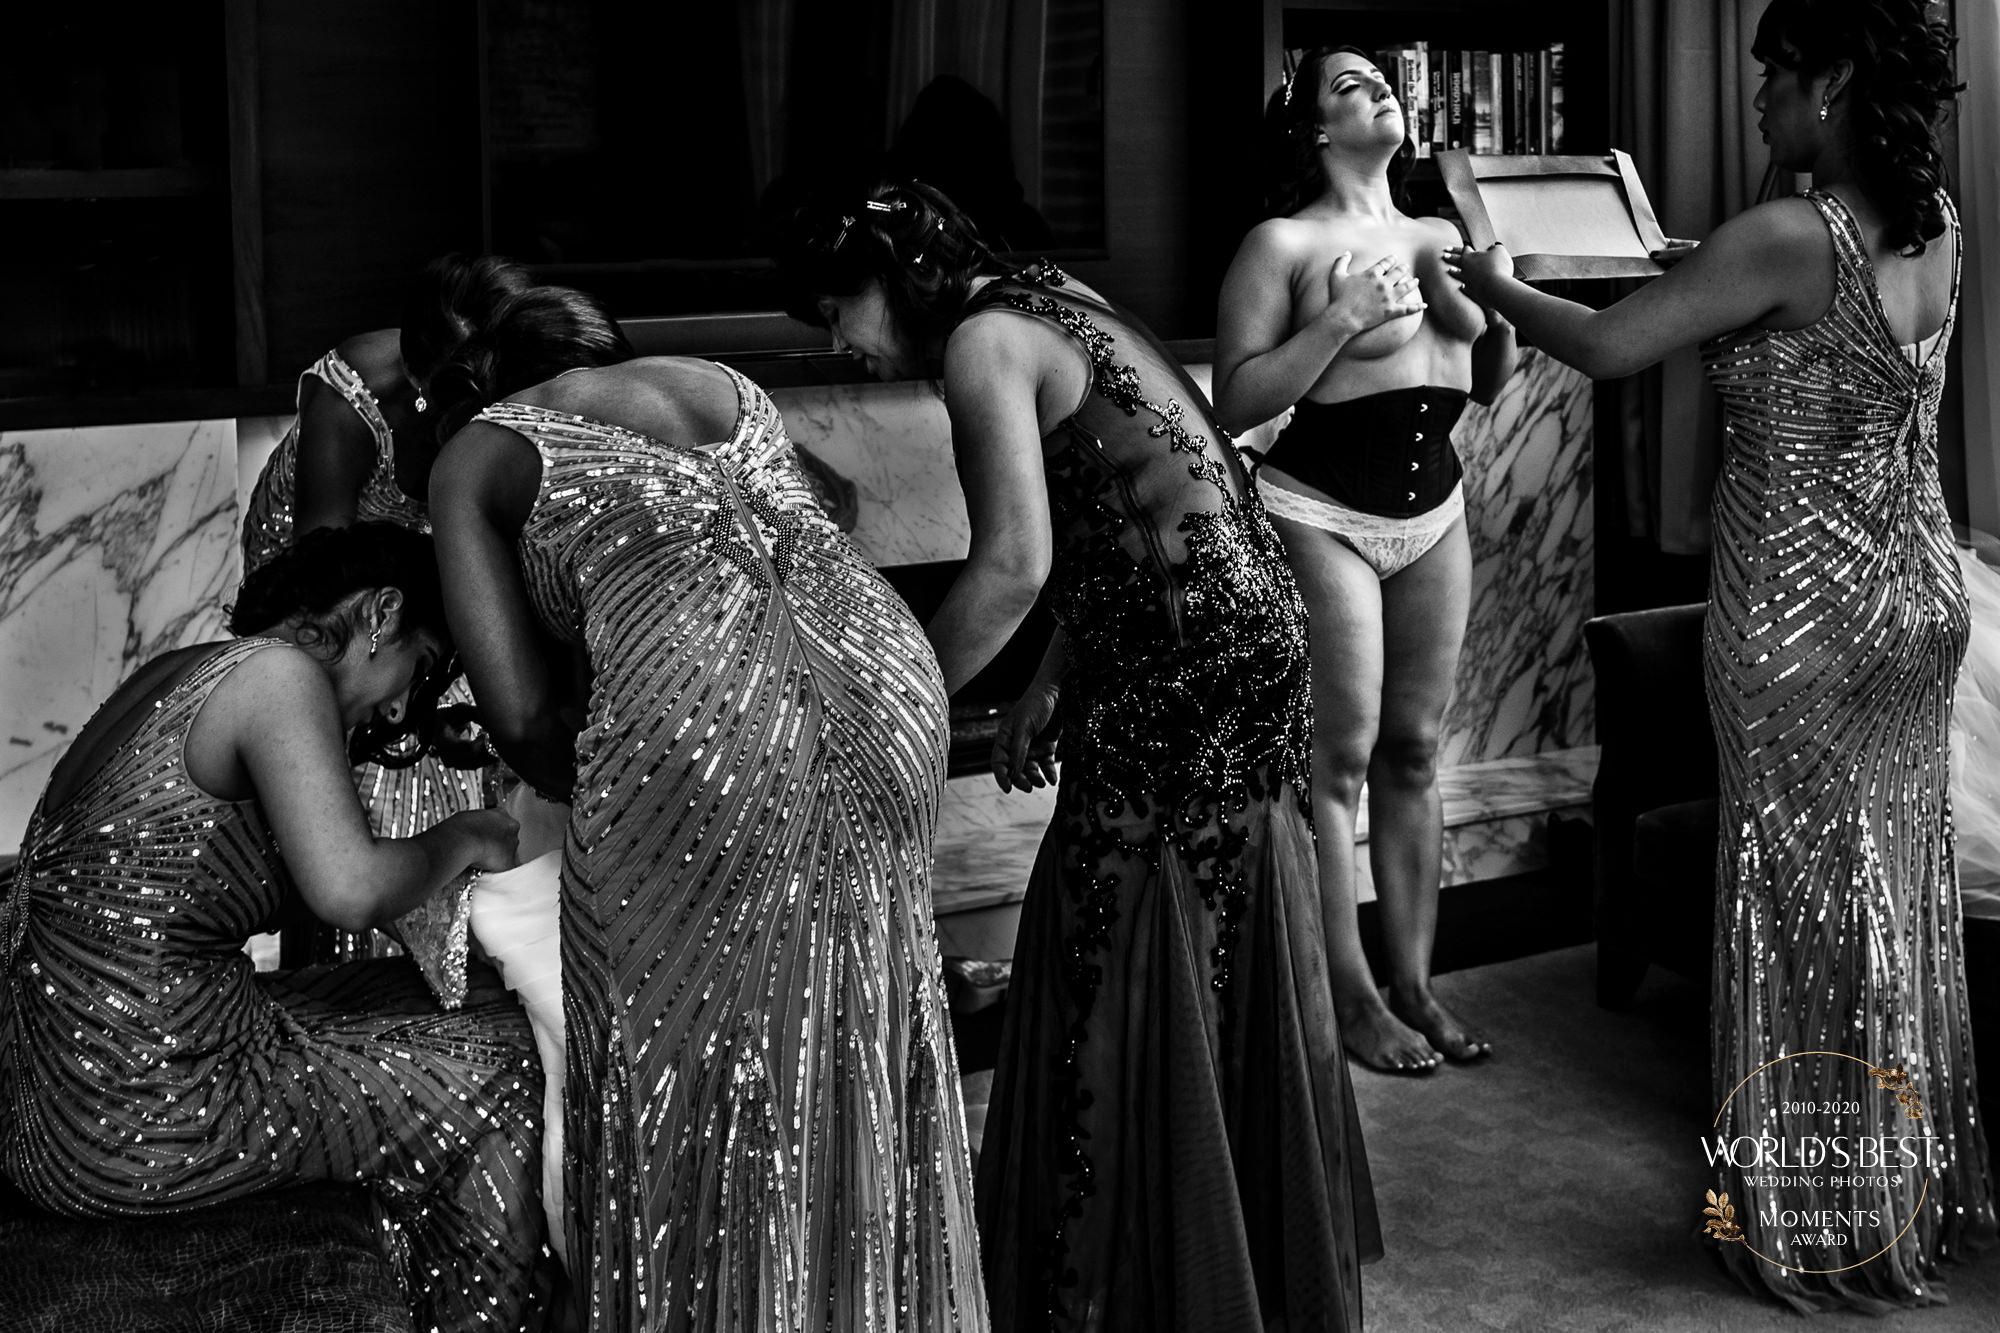 50 Best Documentary Wedding Photos of the Decade - photo by JAGstudios